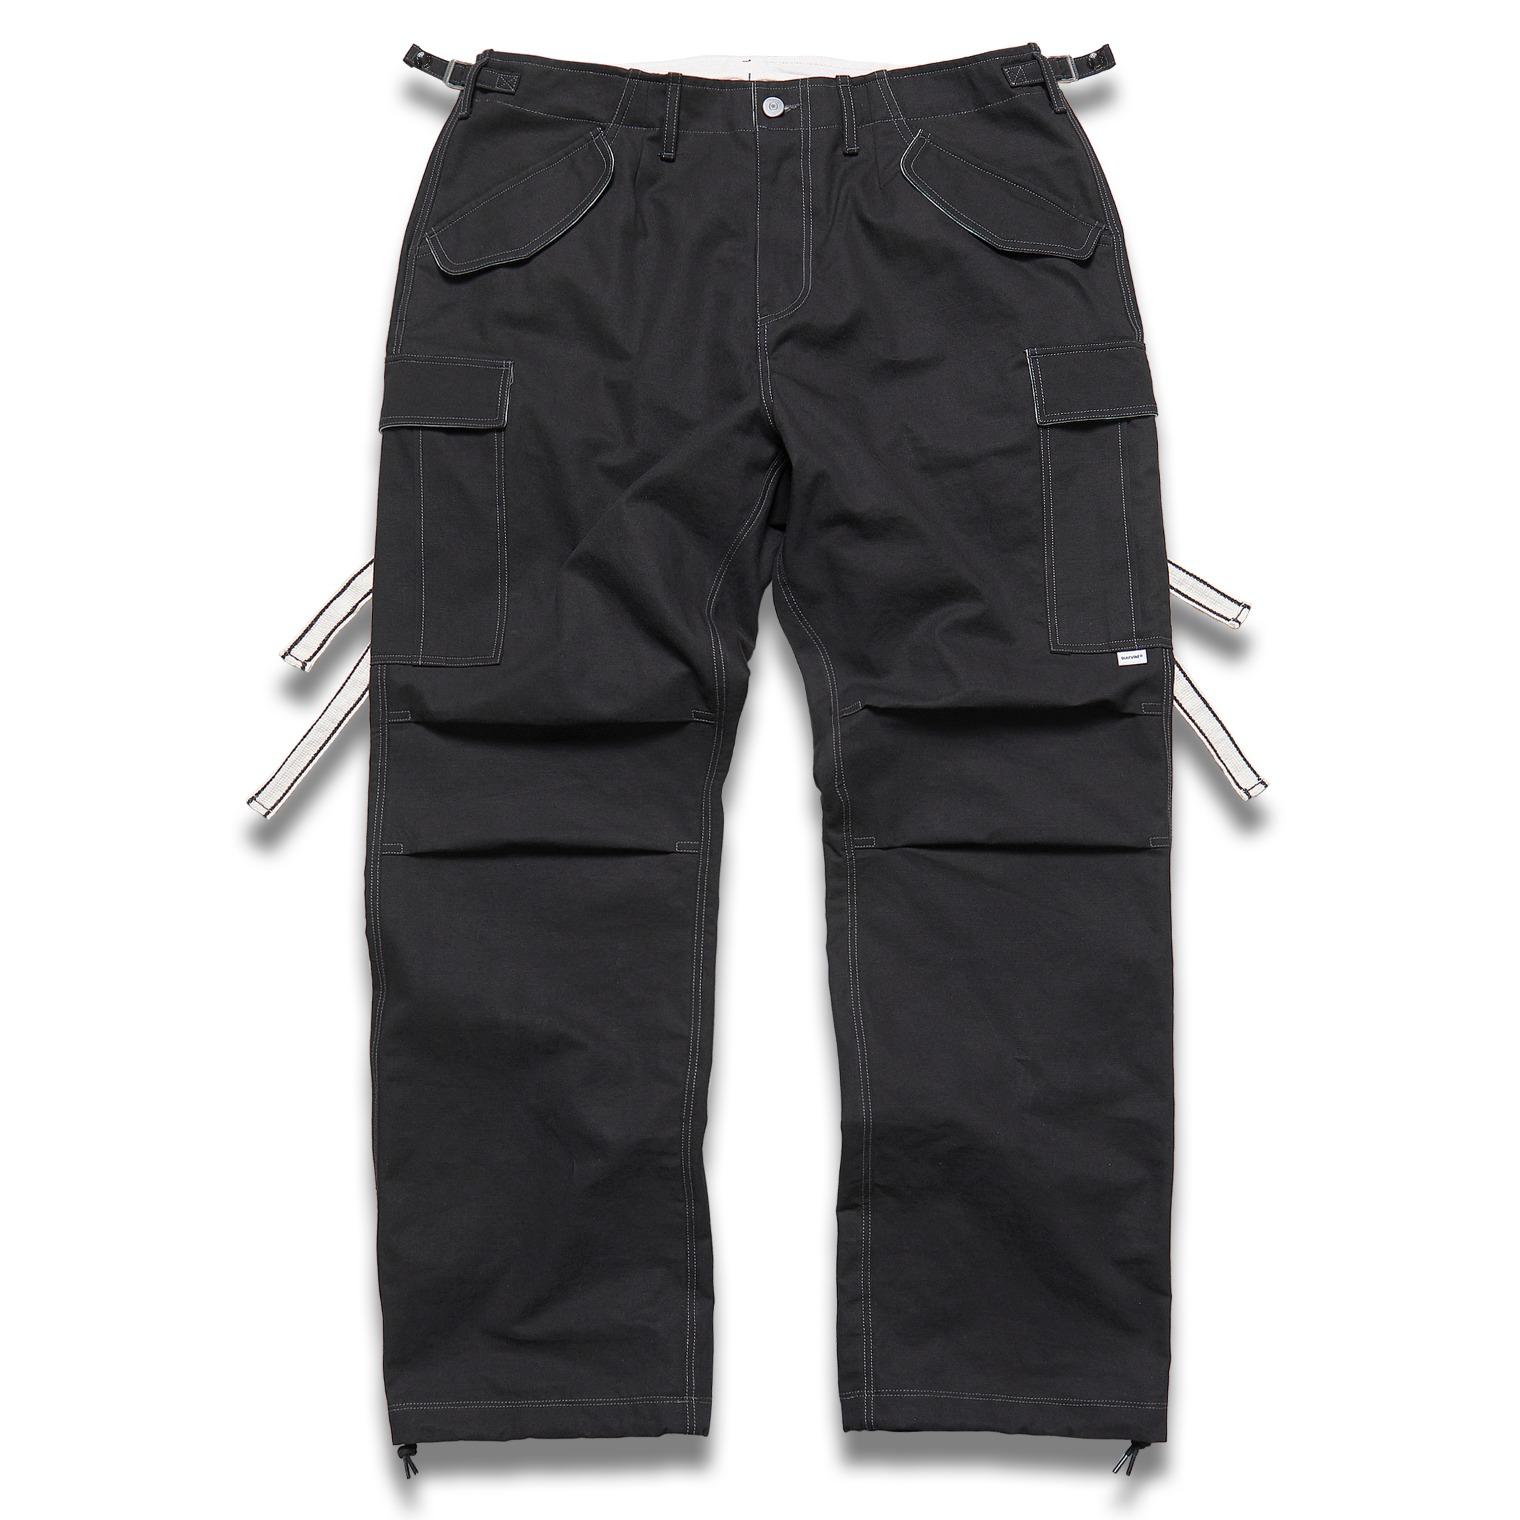 DV.LOT 638 M-51 Field Trousers -BLACK-